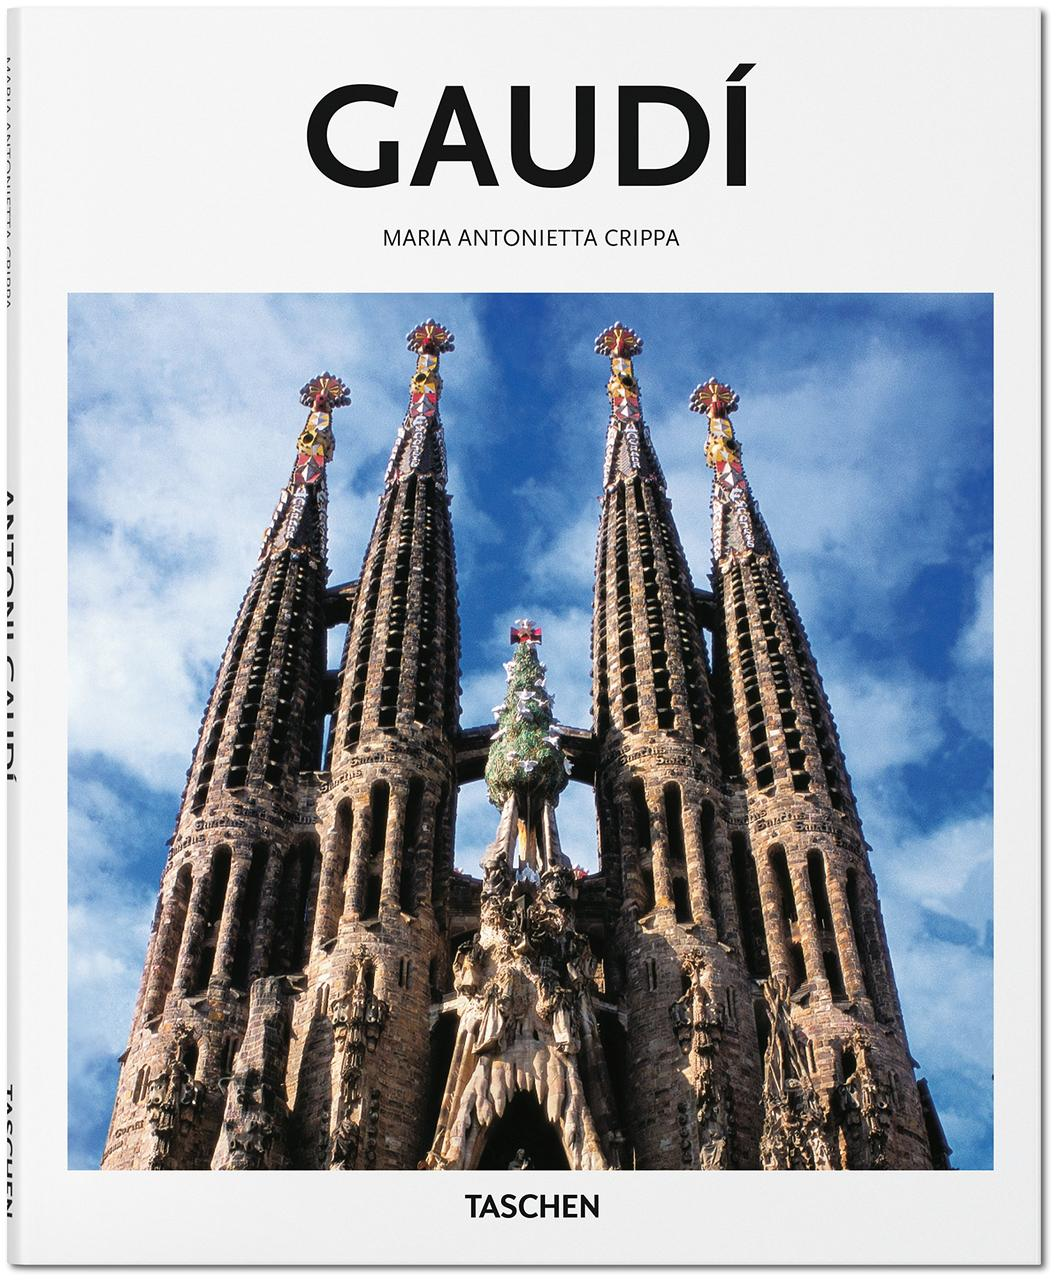 Gaudi. Maria Antonietta Crippa